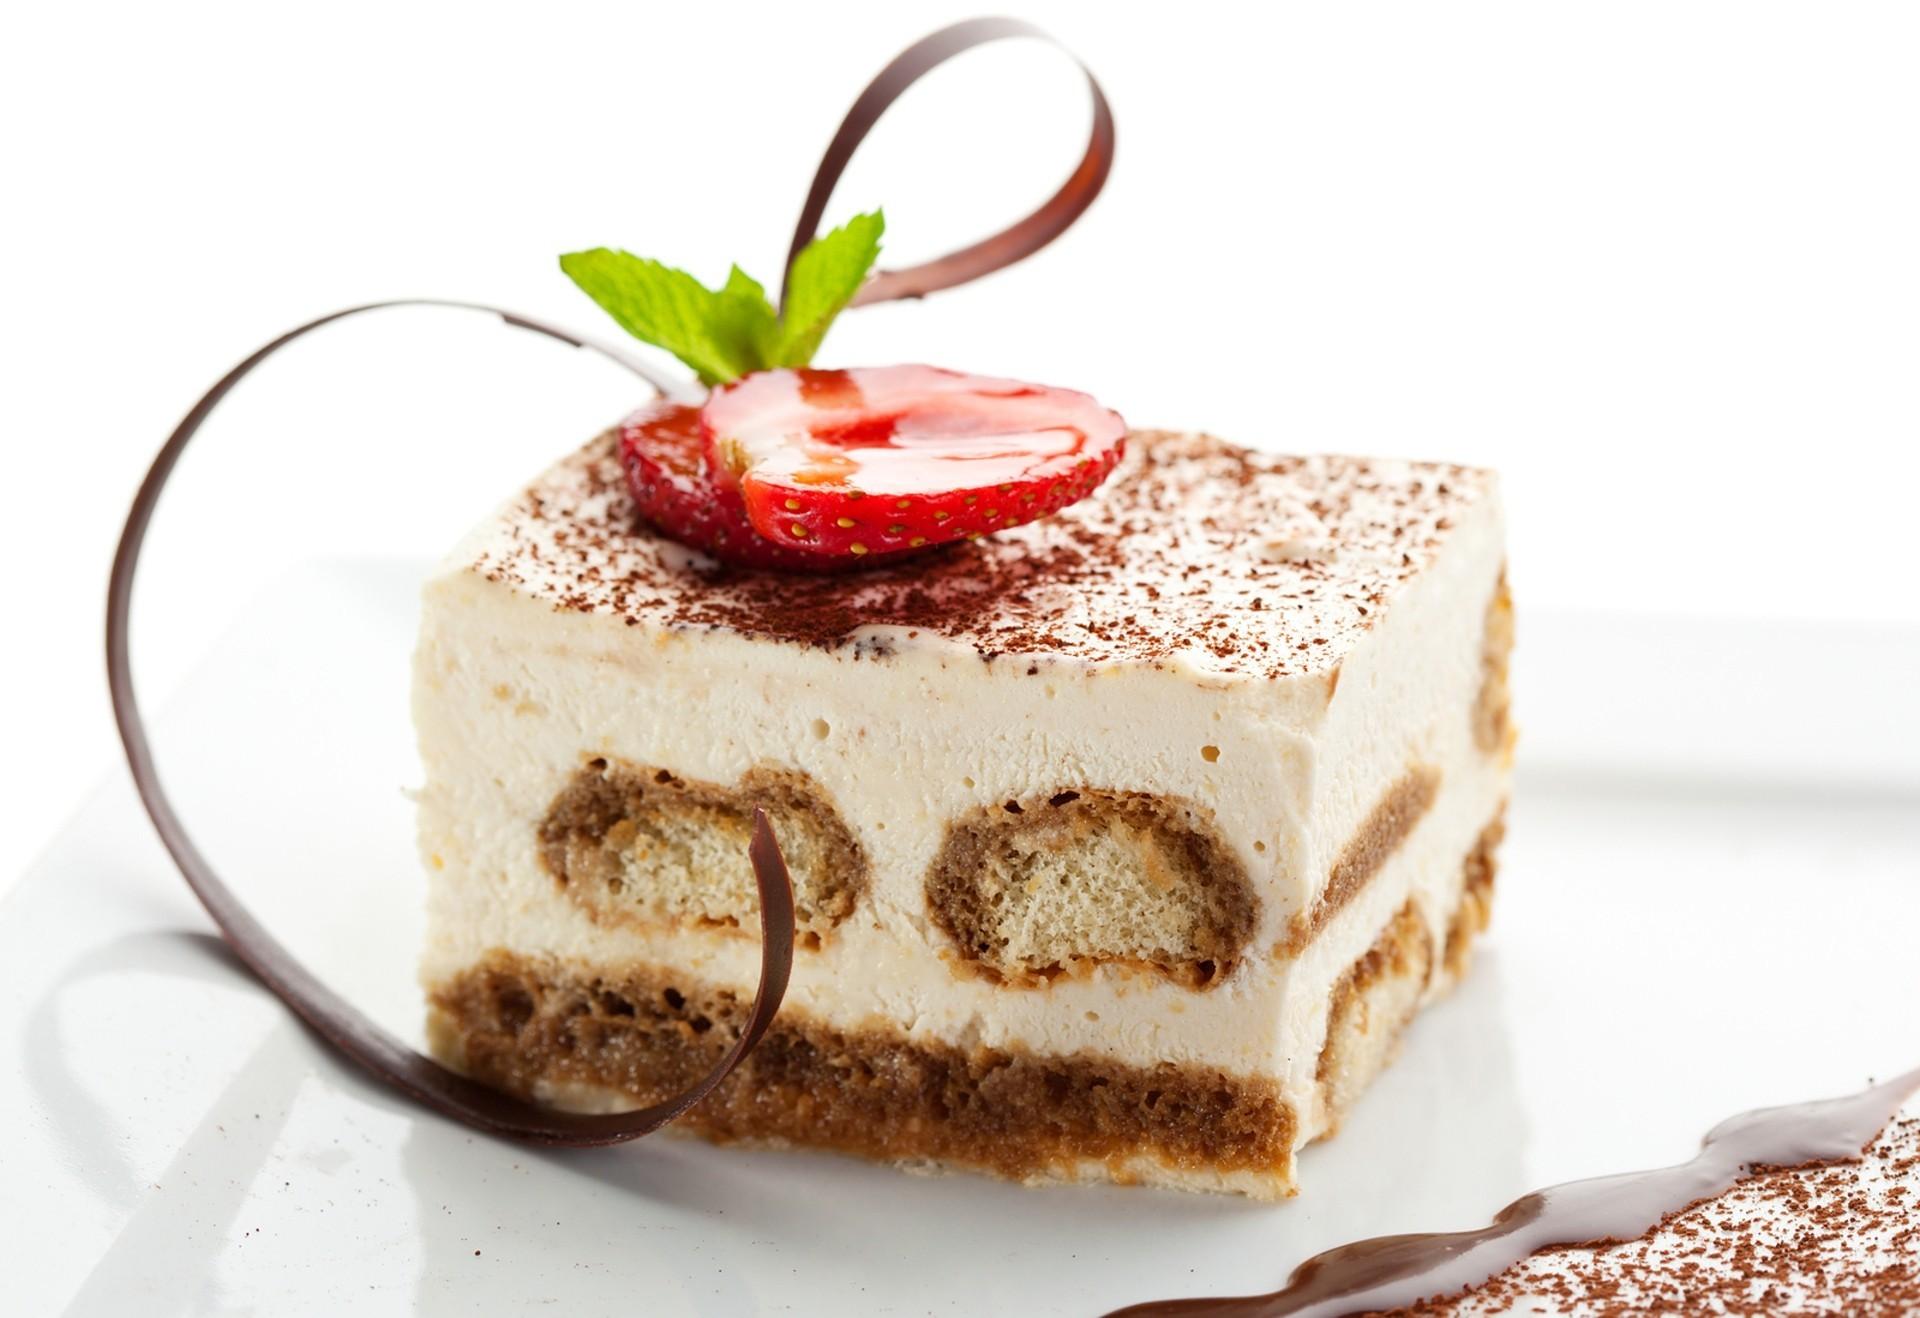 tiramisu-klubnika-tort-krem-yagody-eda-sladkij-desert